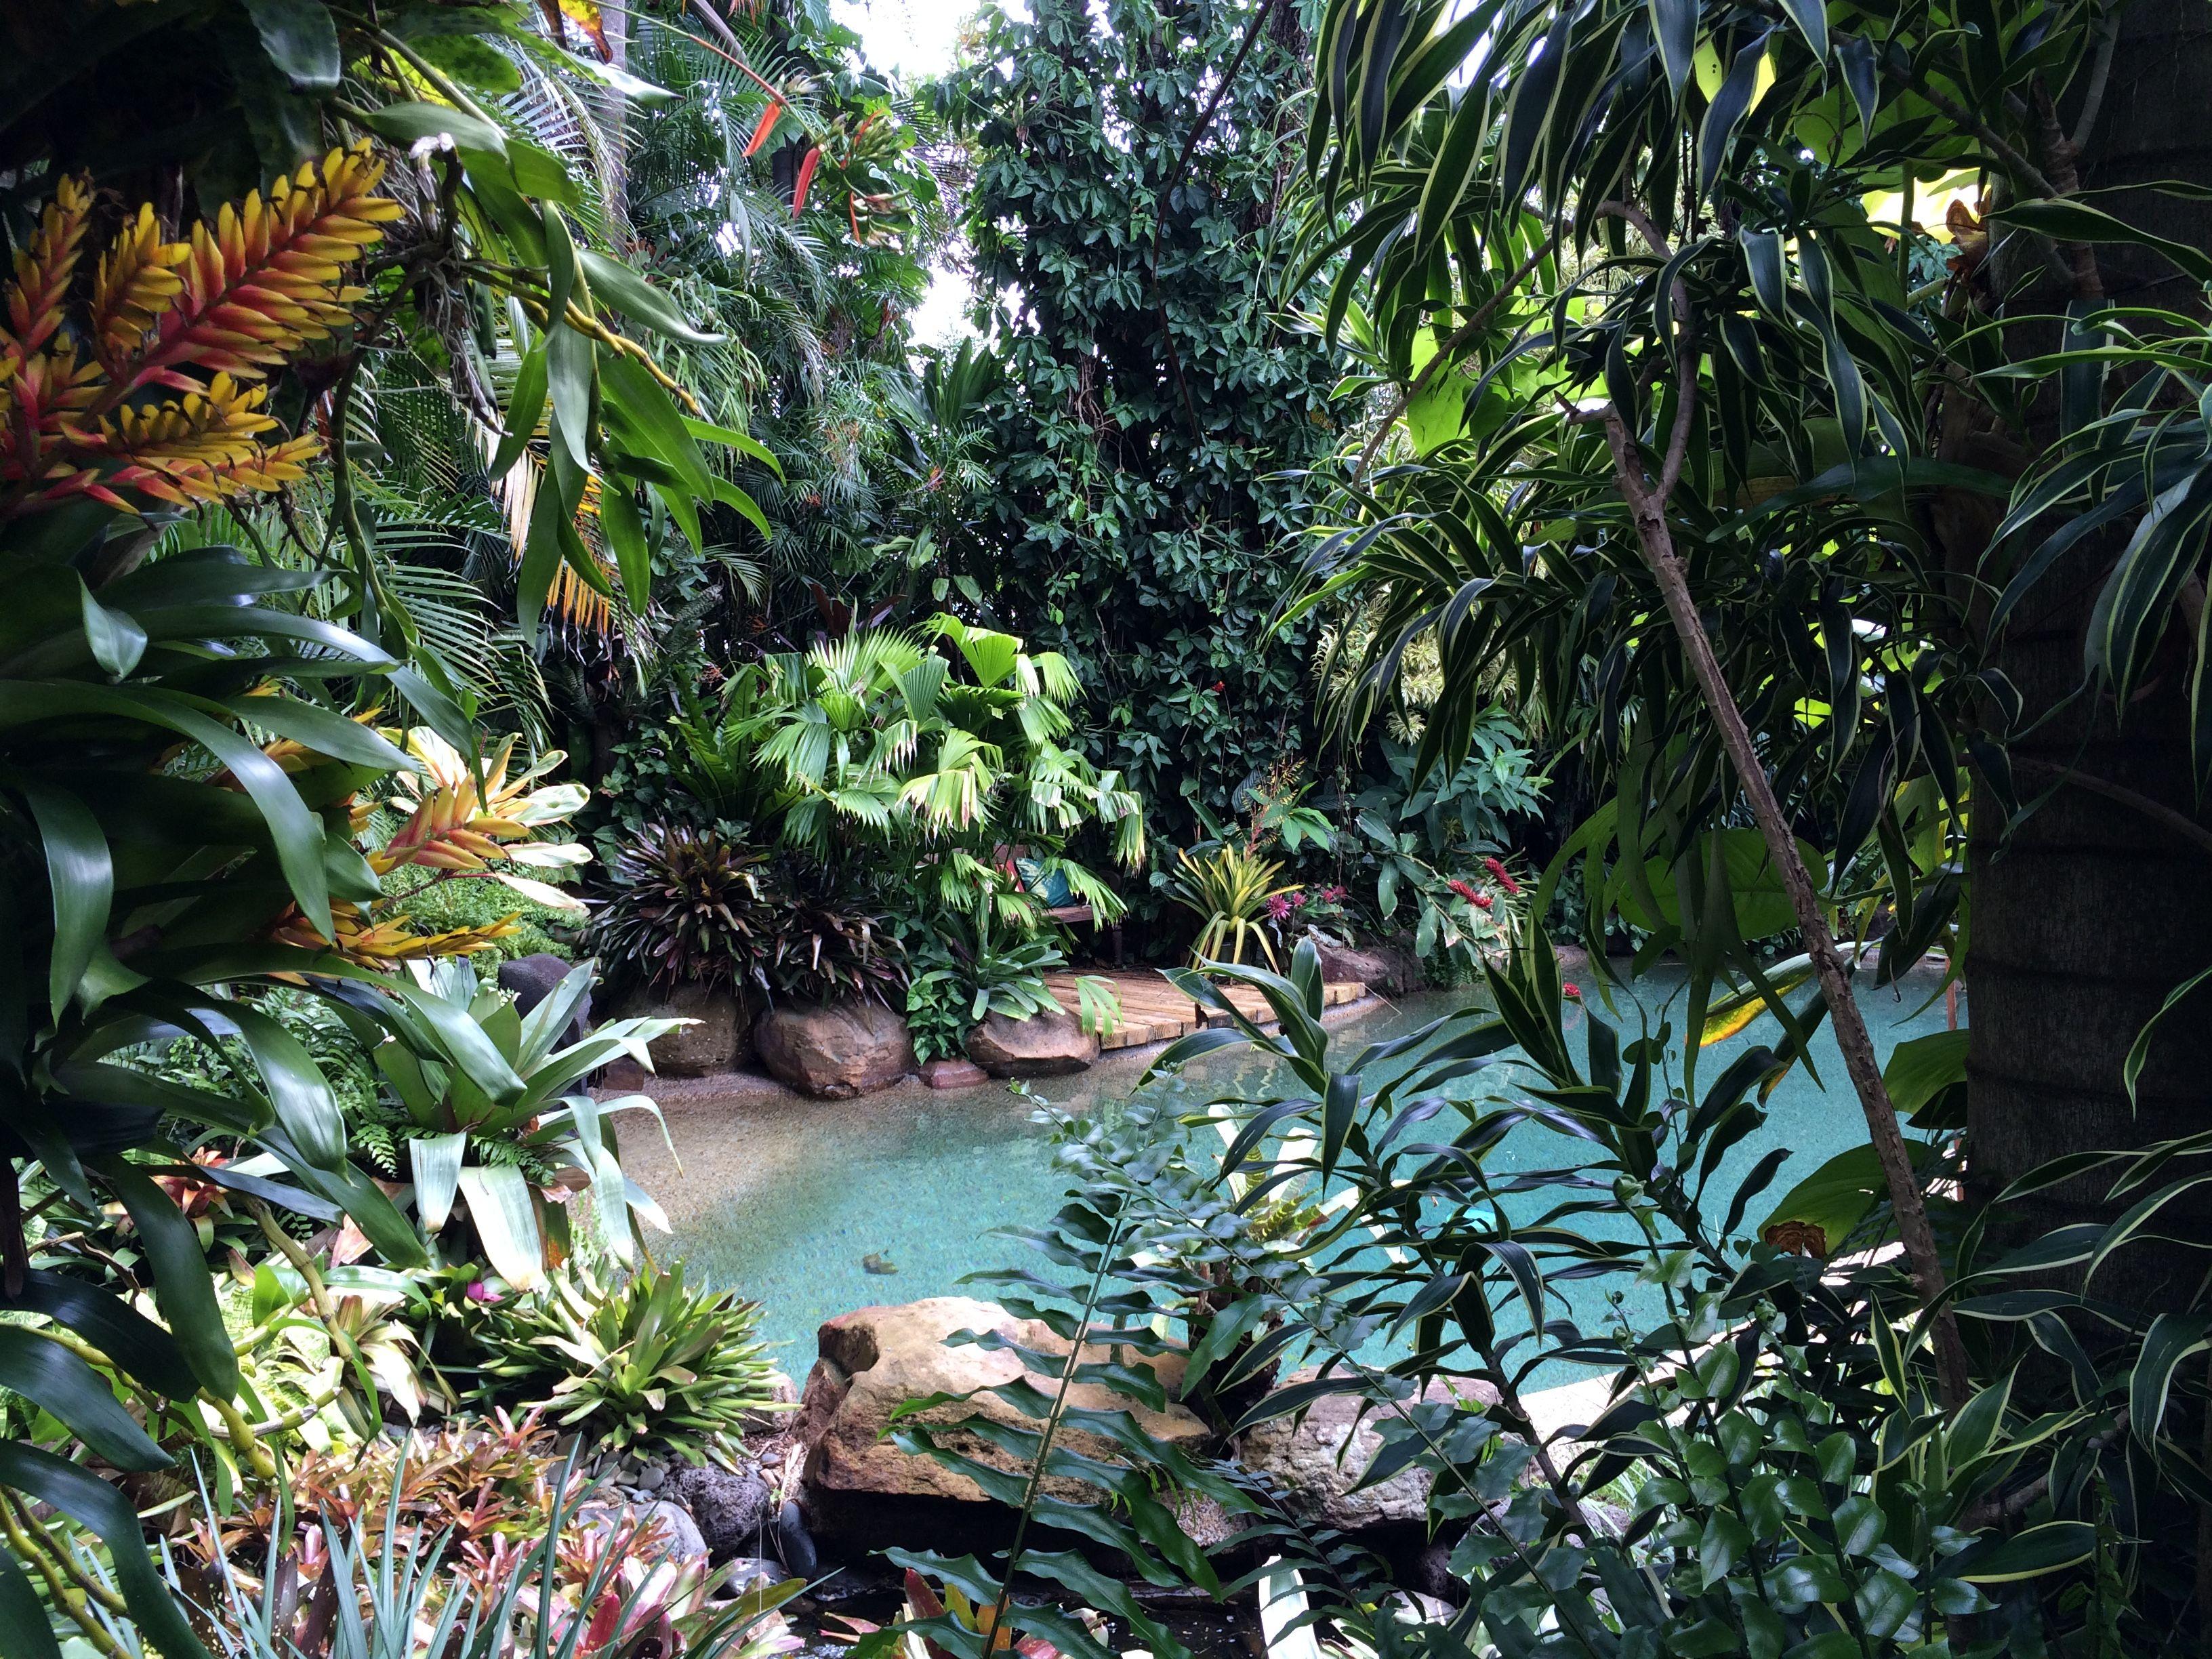 Tropical garden tropical pool dennis hundscheidt for Tropical pool gardens